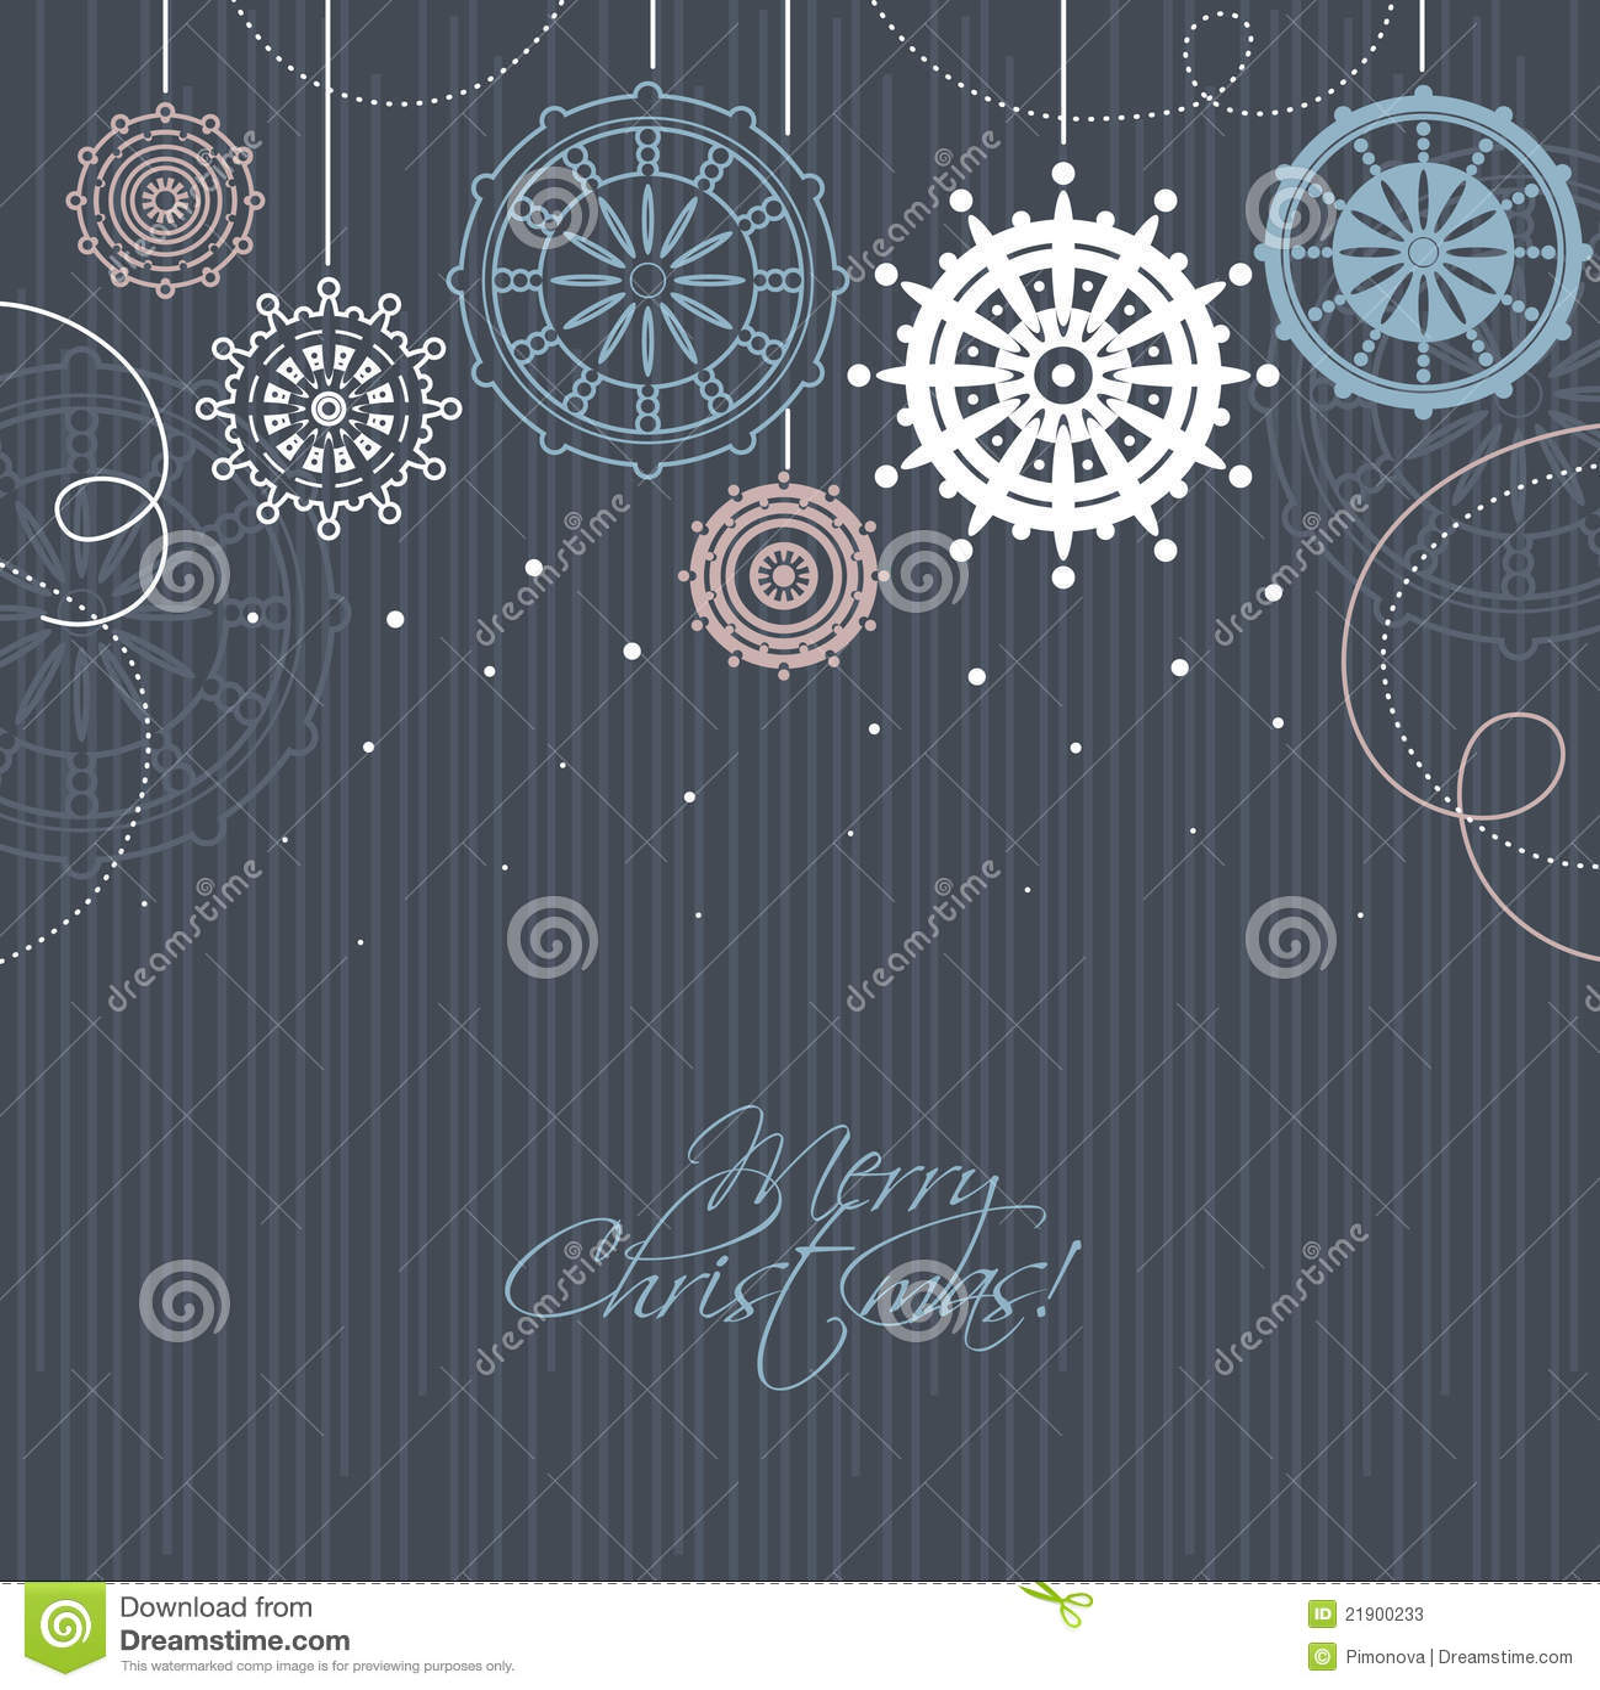 Modern Christmas Background Stock Photos - Image: 21900233